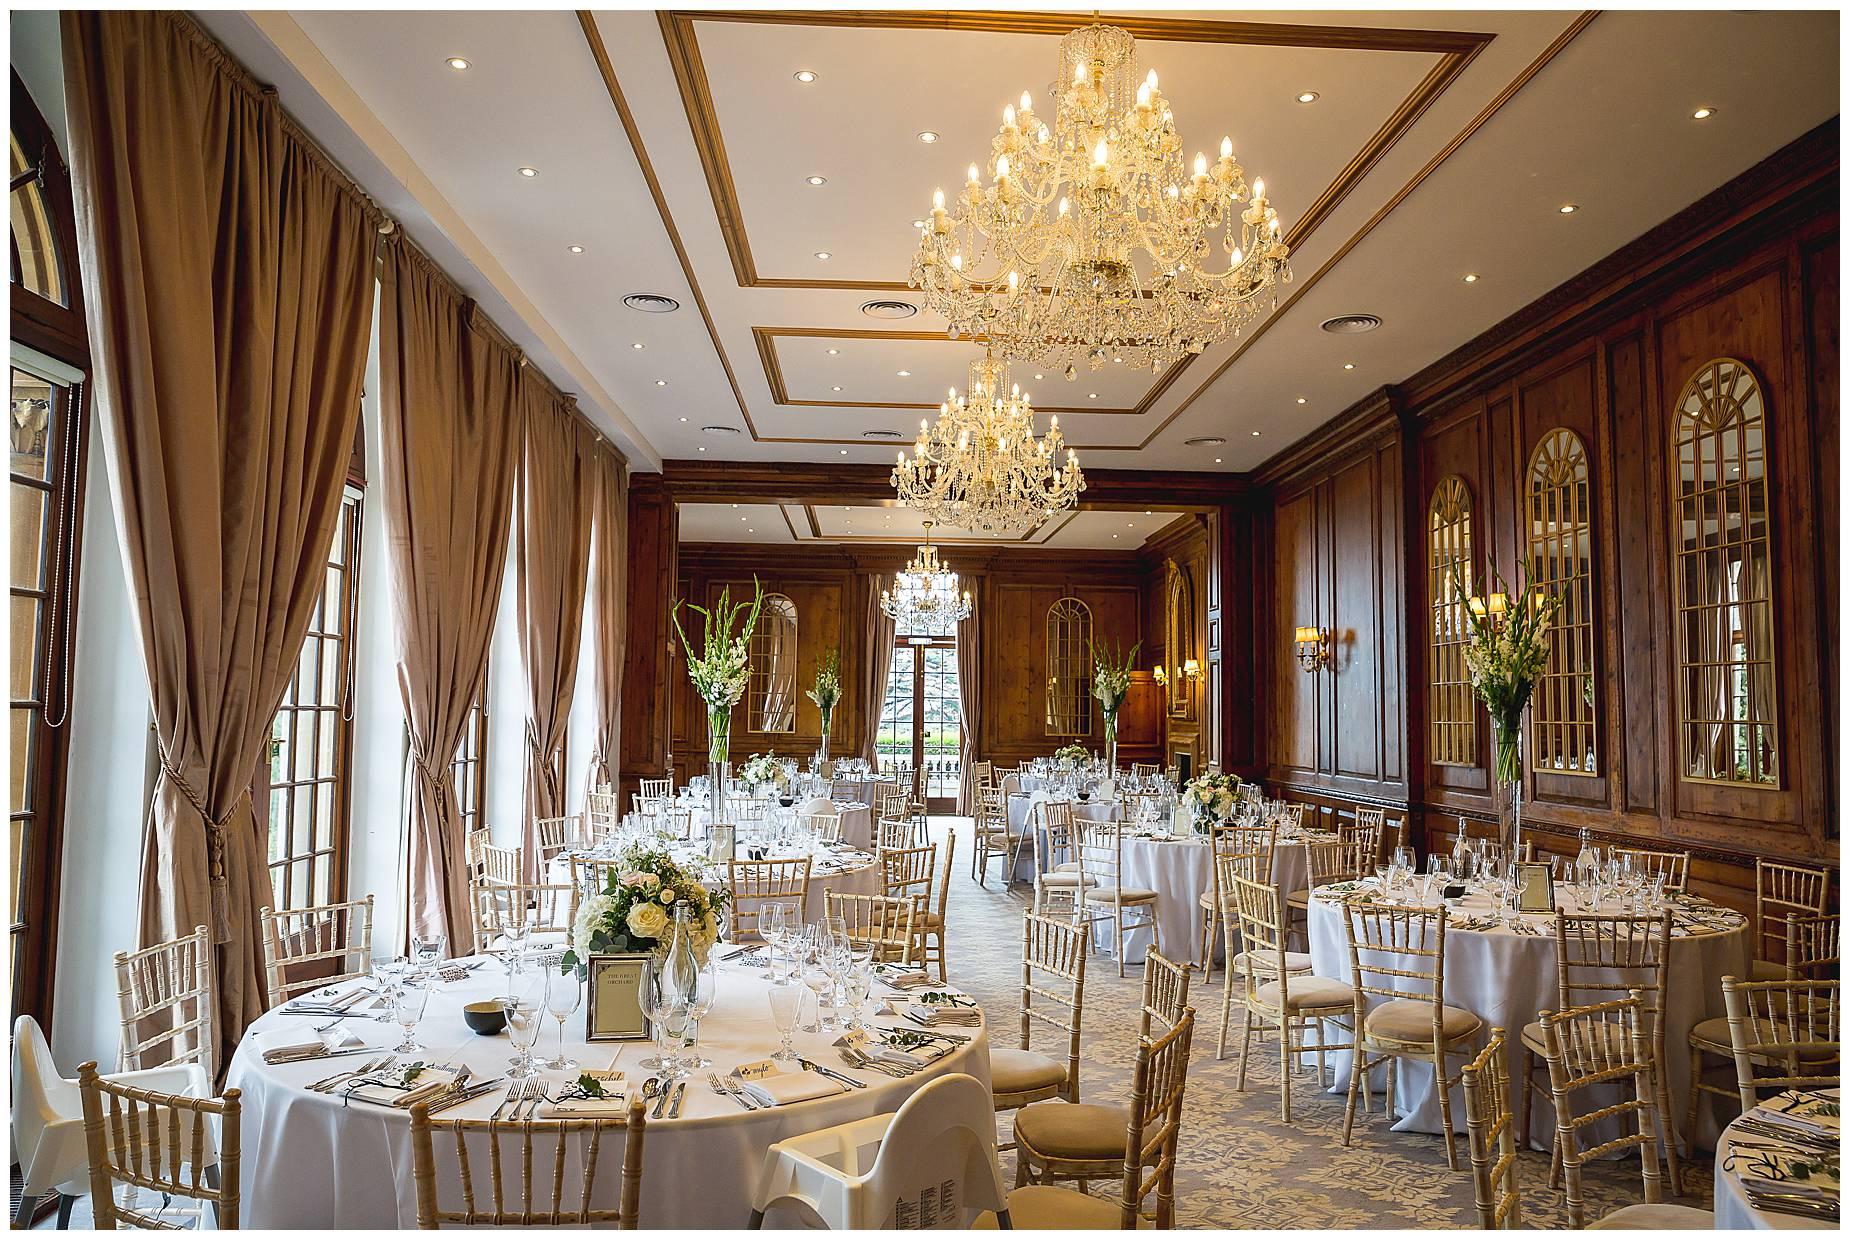 Hedsor House dining room